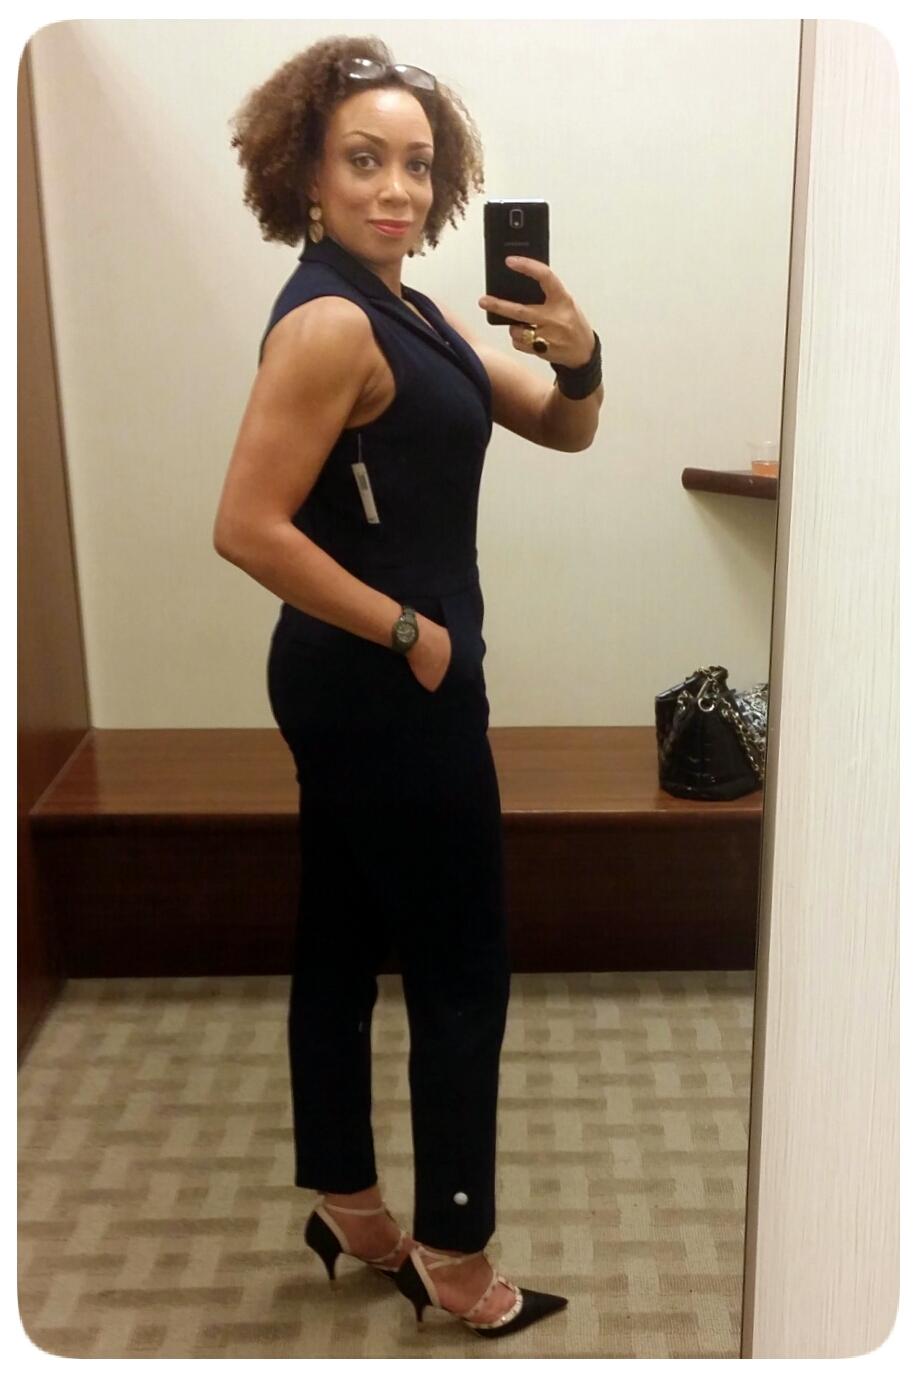 Trina Turk Emmalyn Jumpsuit - Erica B's DIY Style!